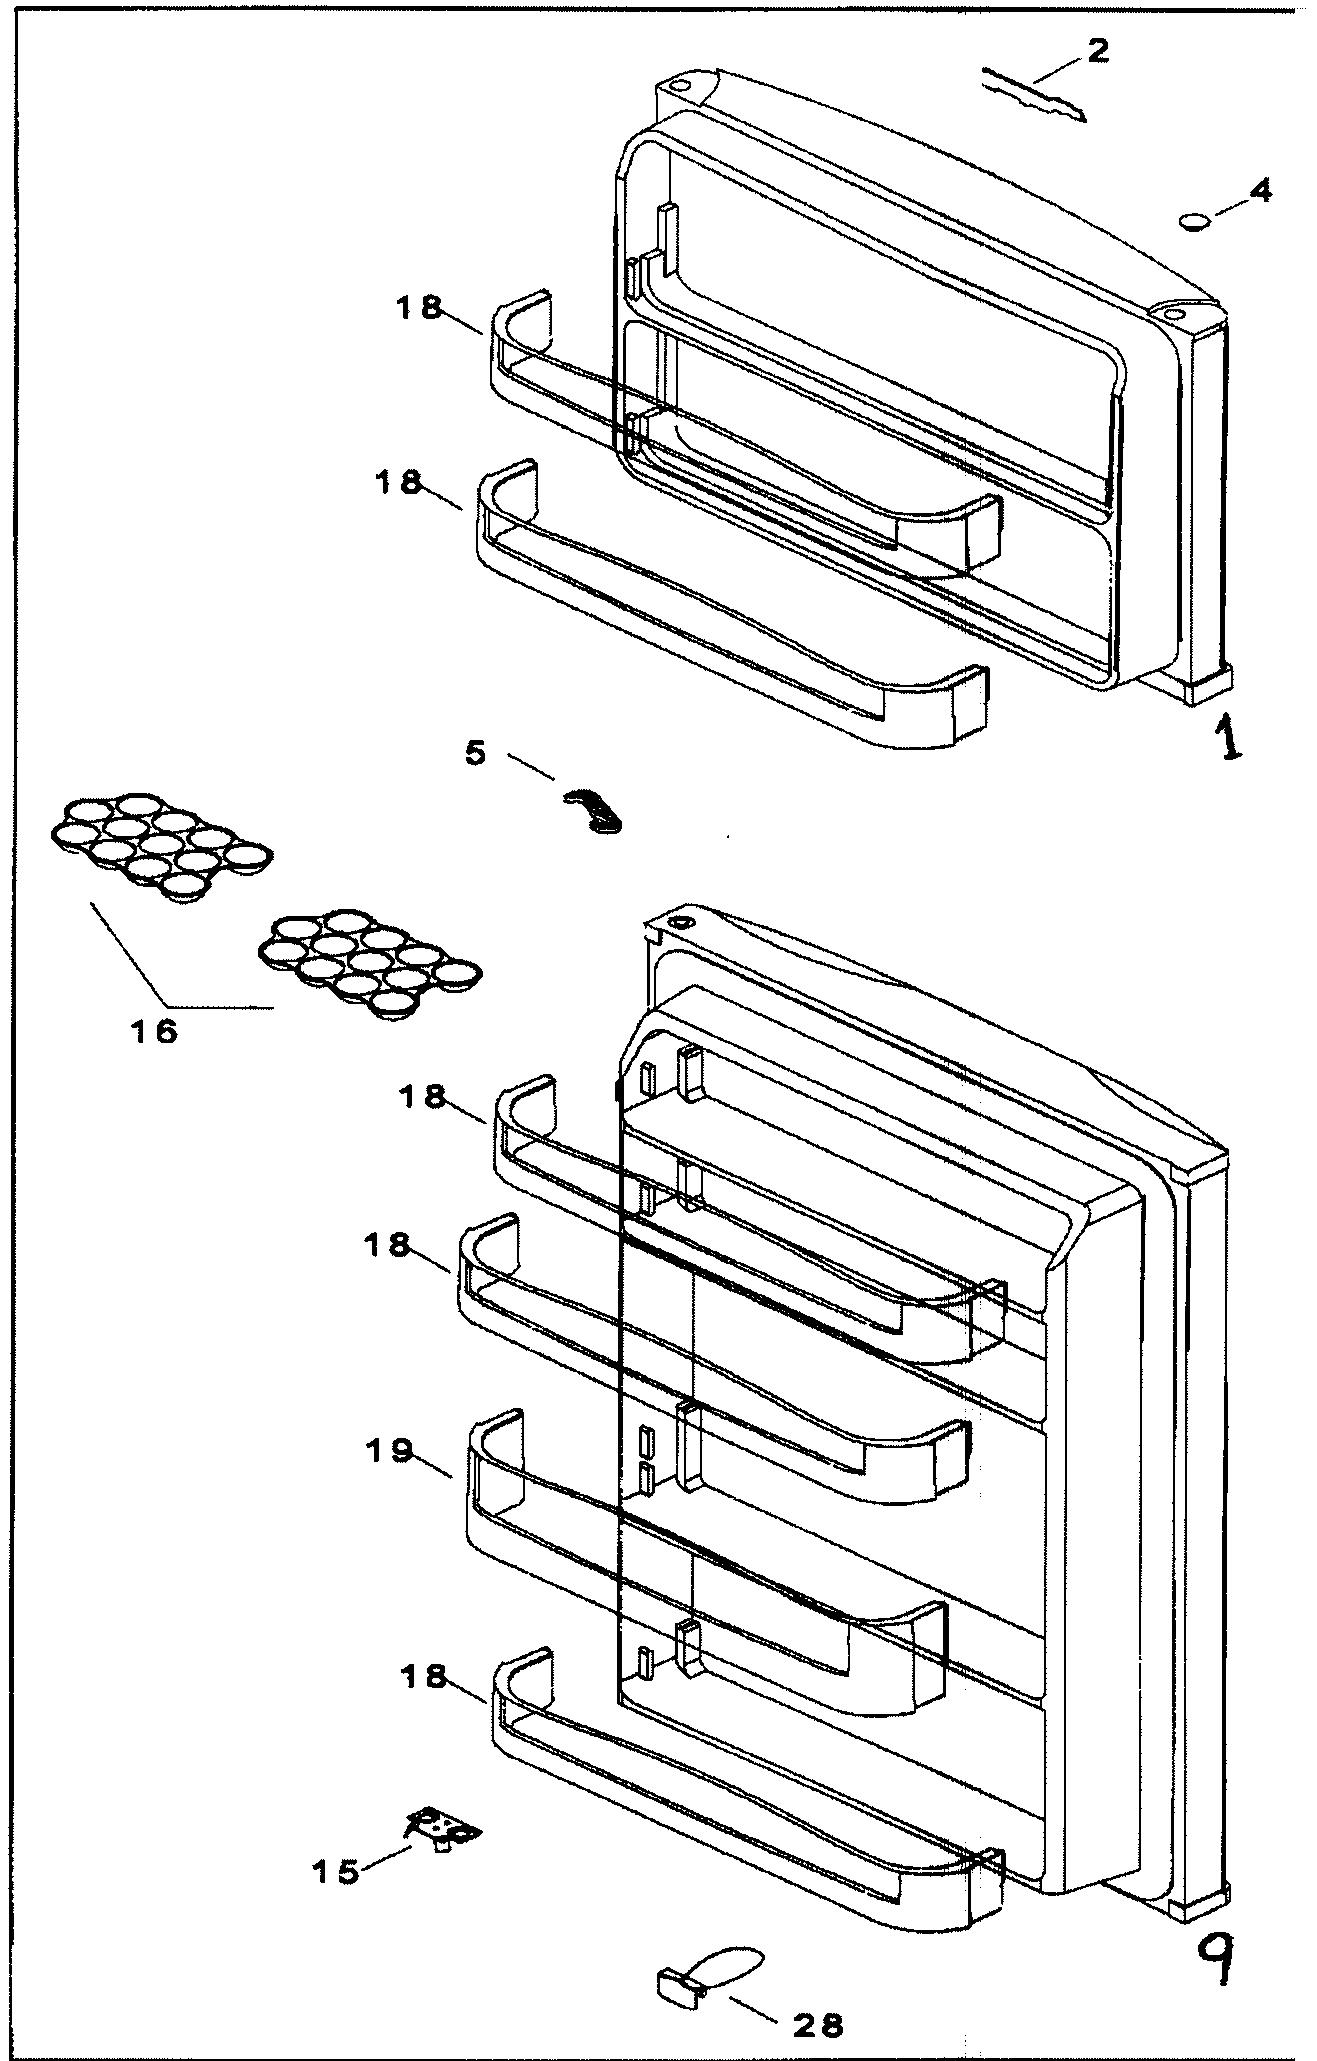 Refrigerator Parts: Refrigerator Parts Name